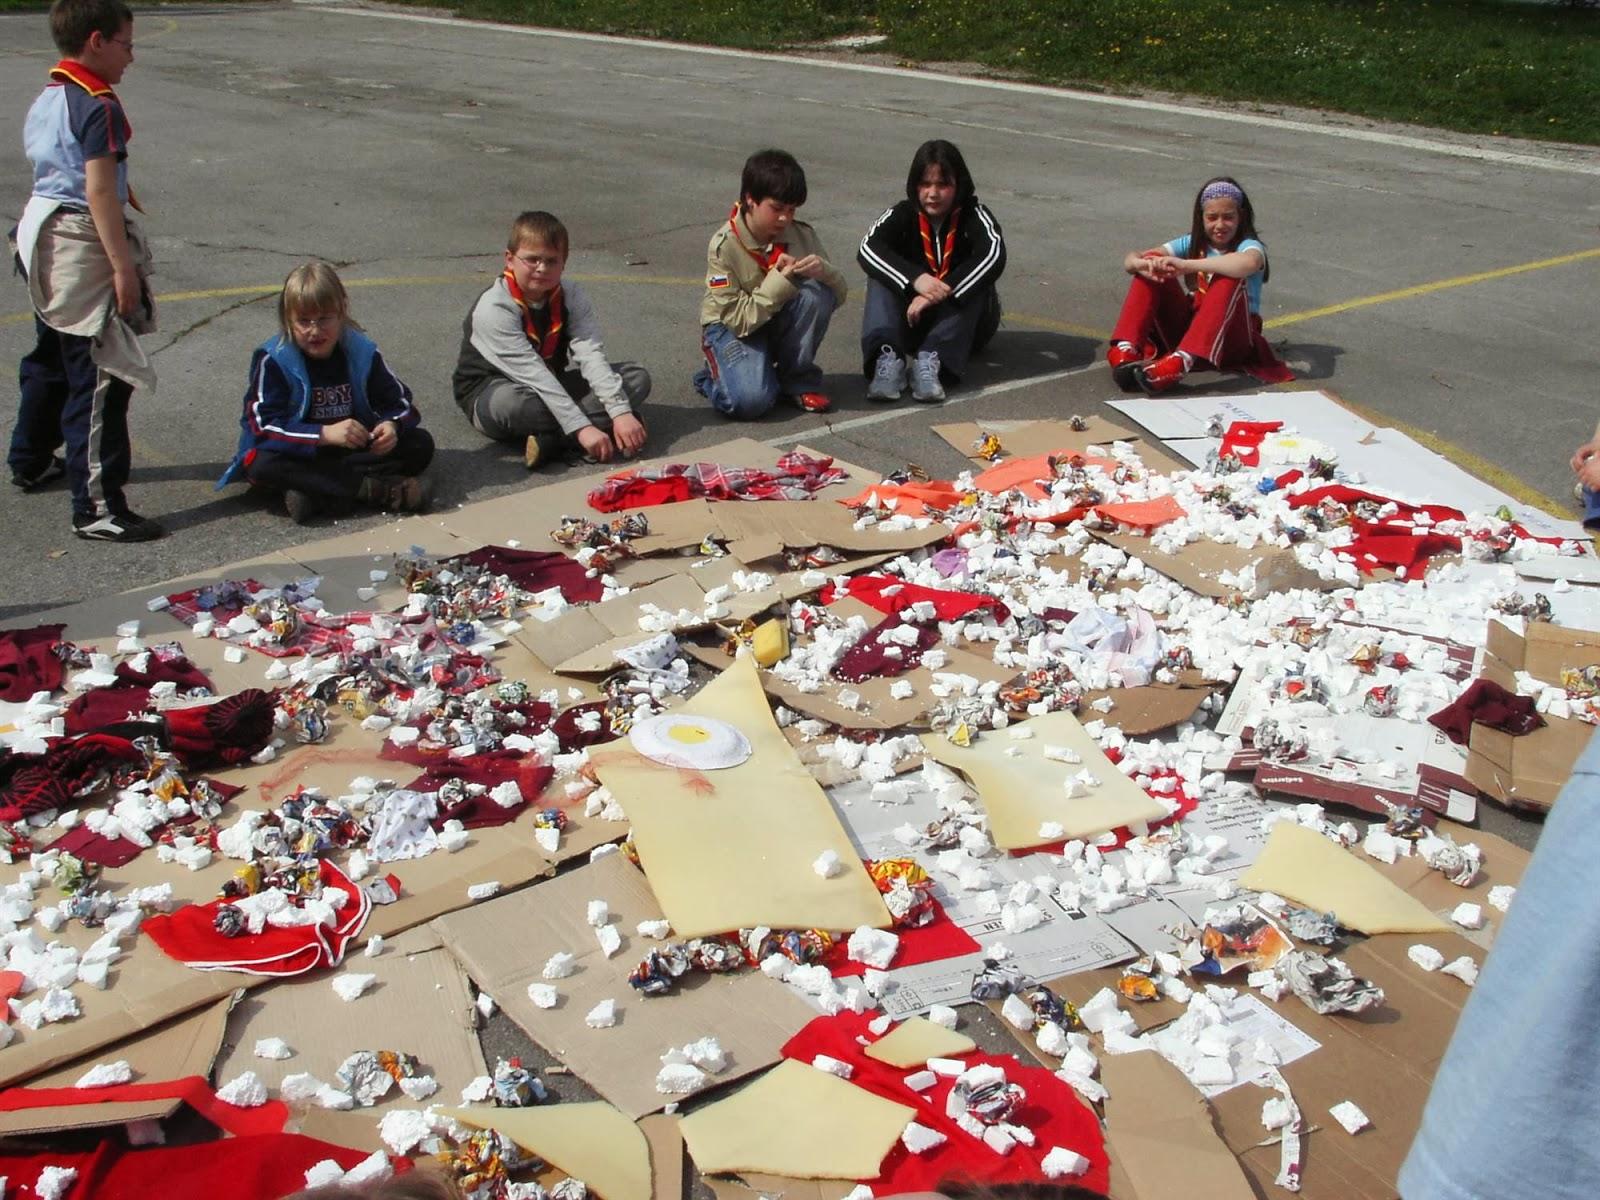 Zbiranje papirja, Ilirska Bistrica 2006 - KIF_8511.JPG